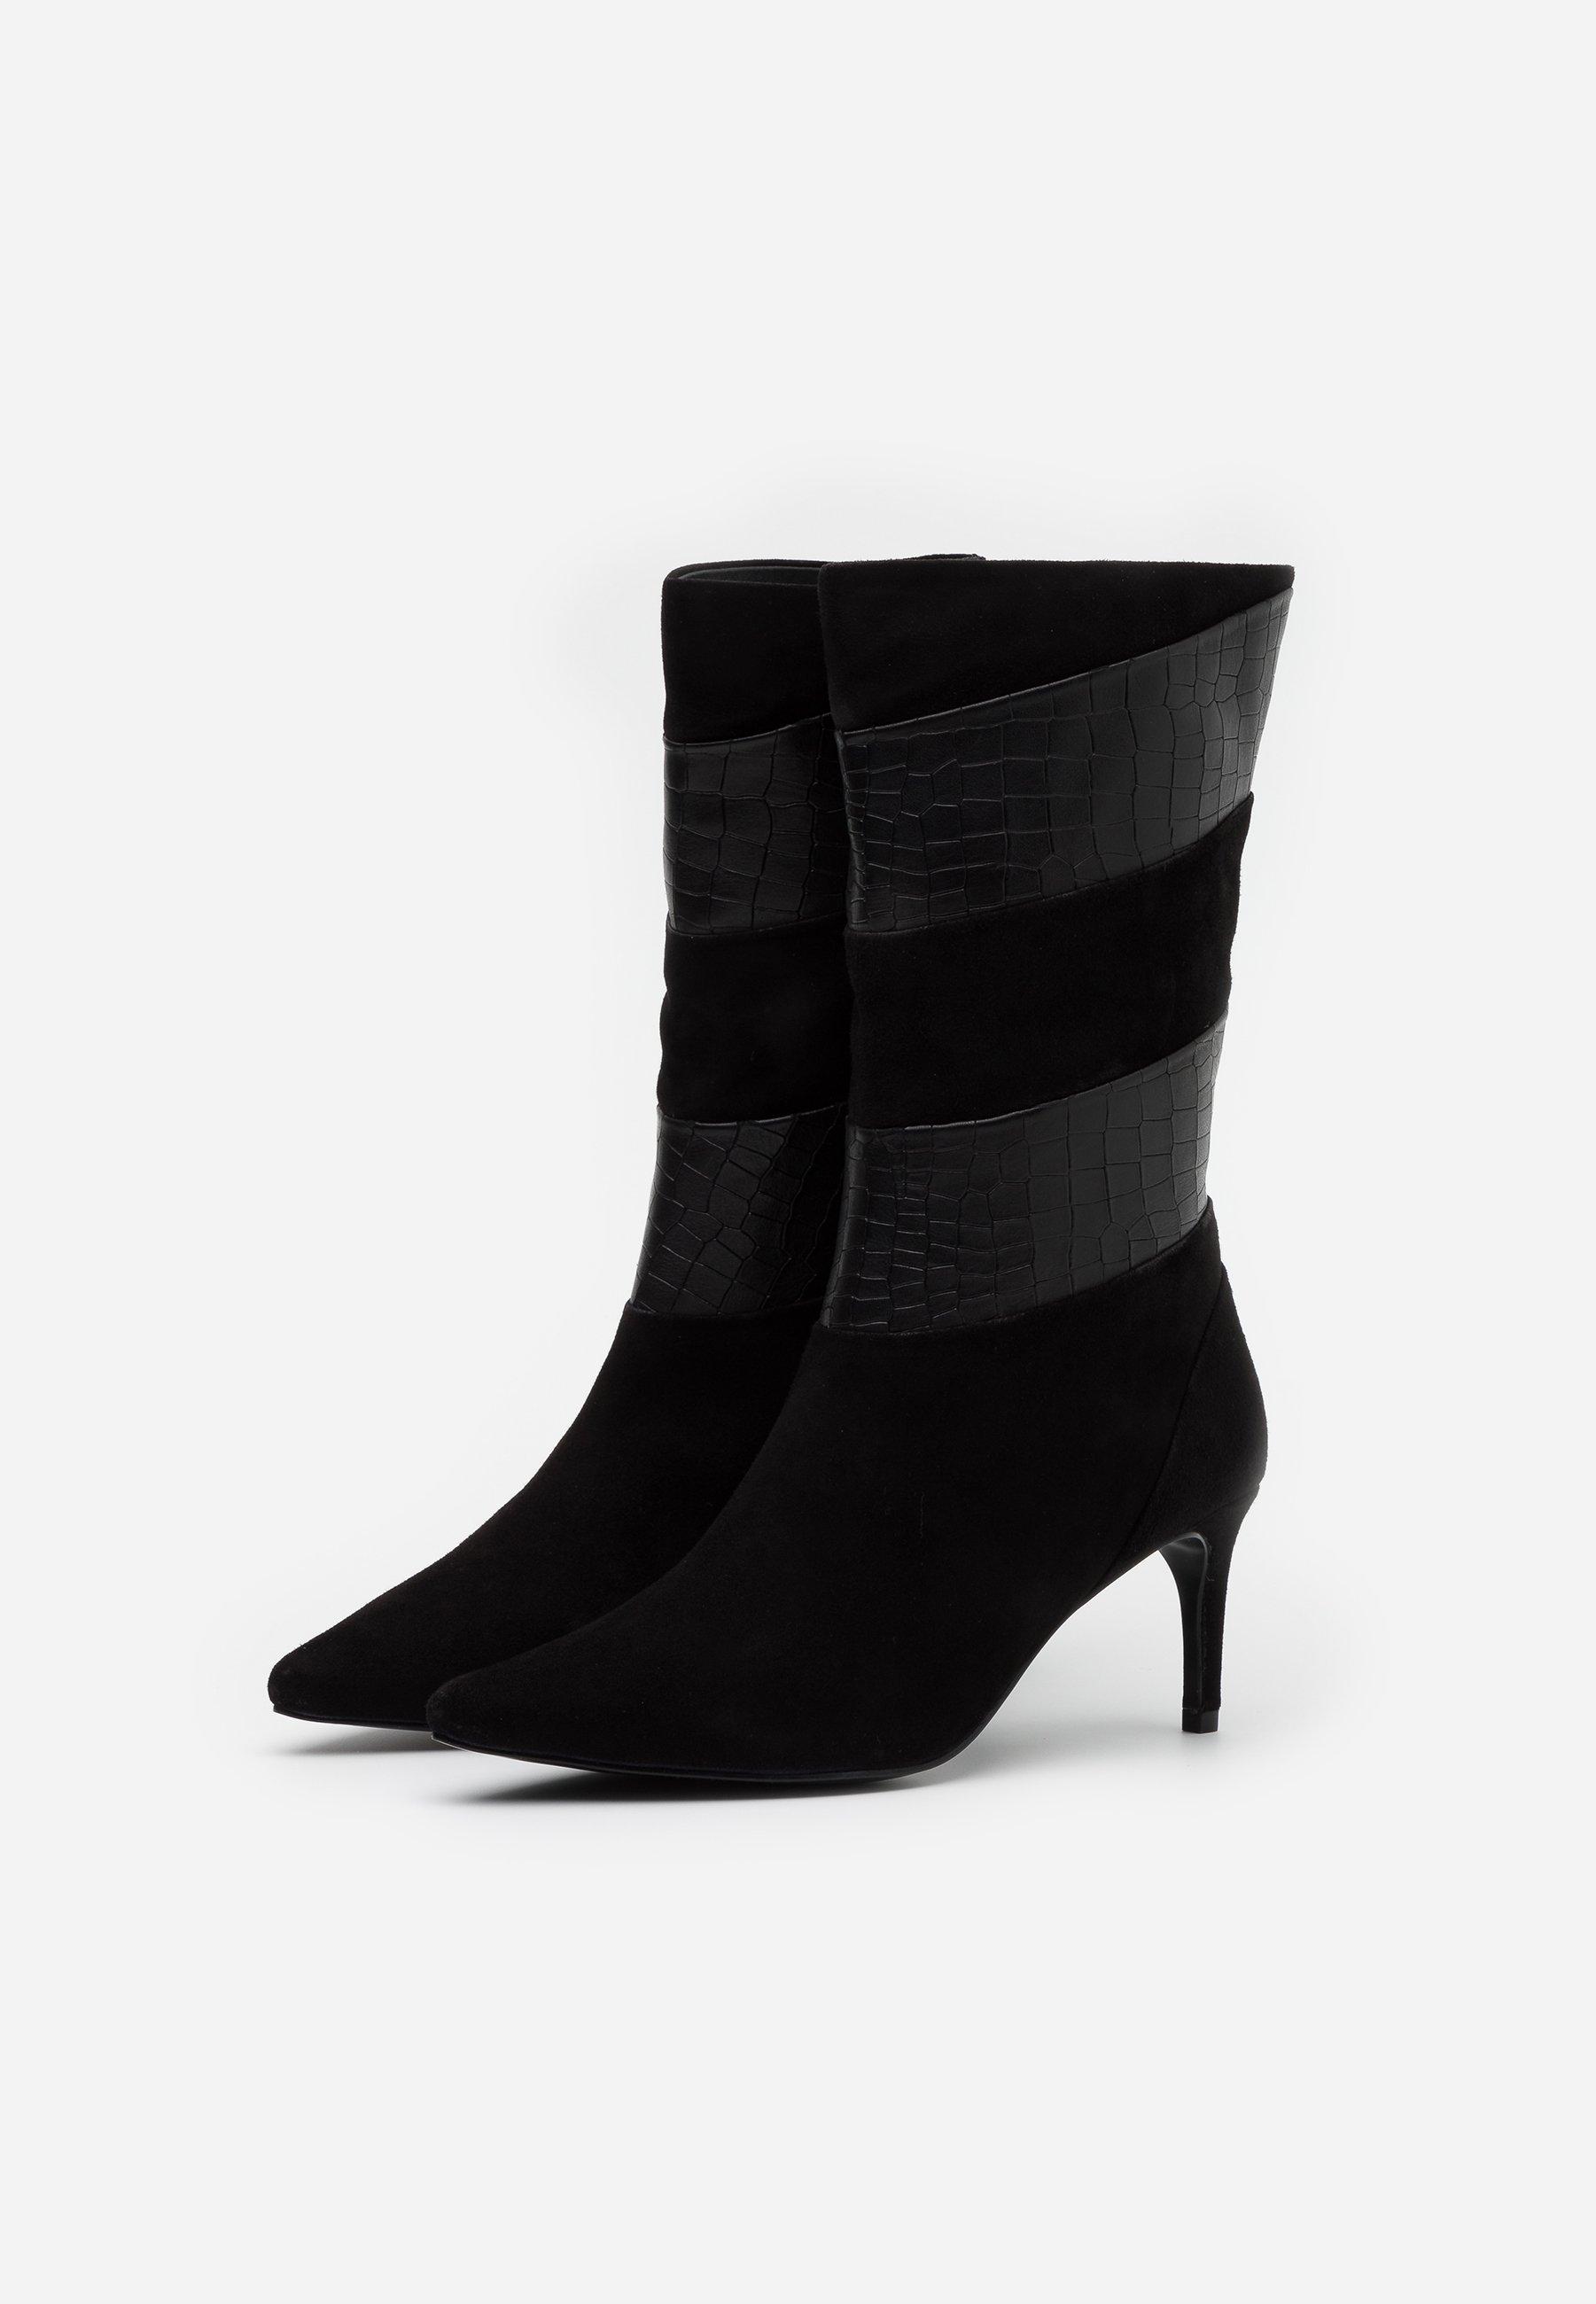 Zign Stiefel black/schwarz